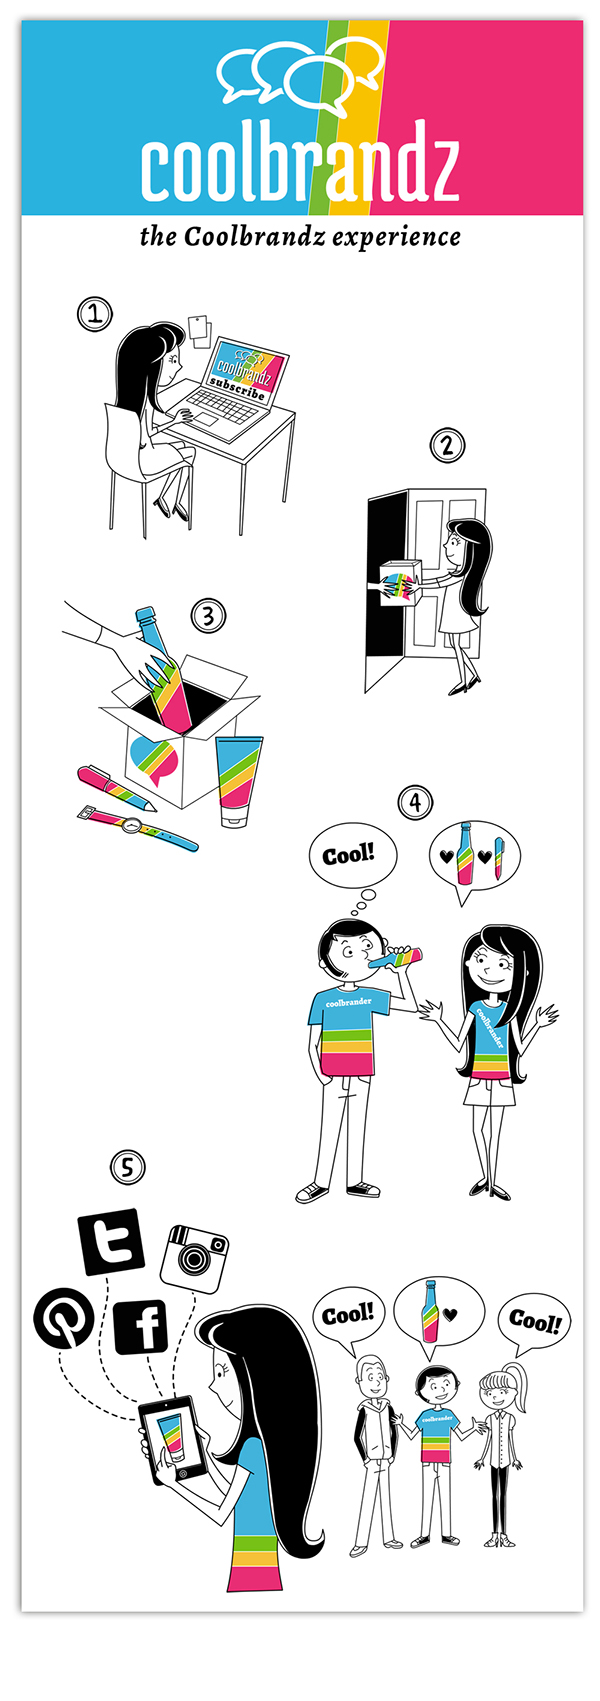 coolbrandz marketing   infographic cool brands